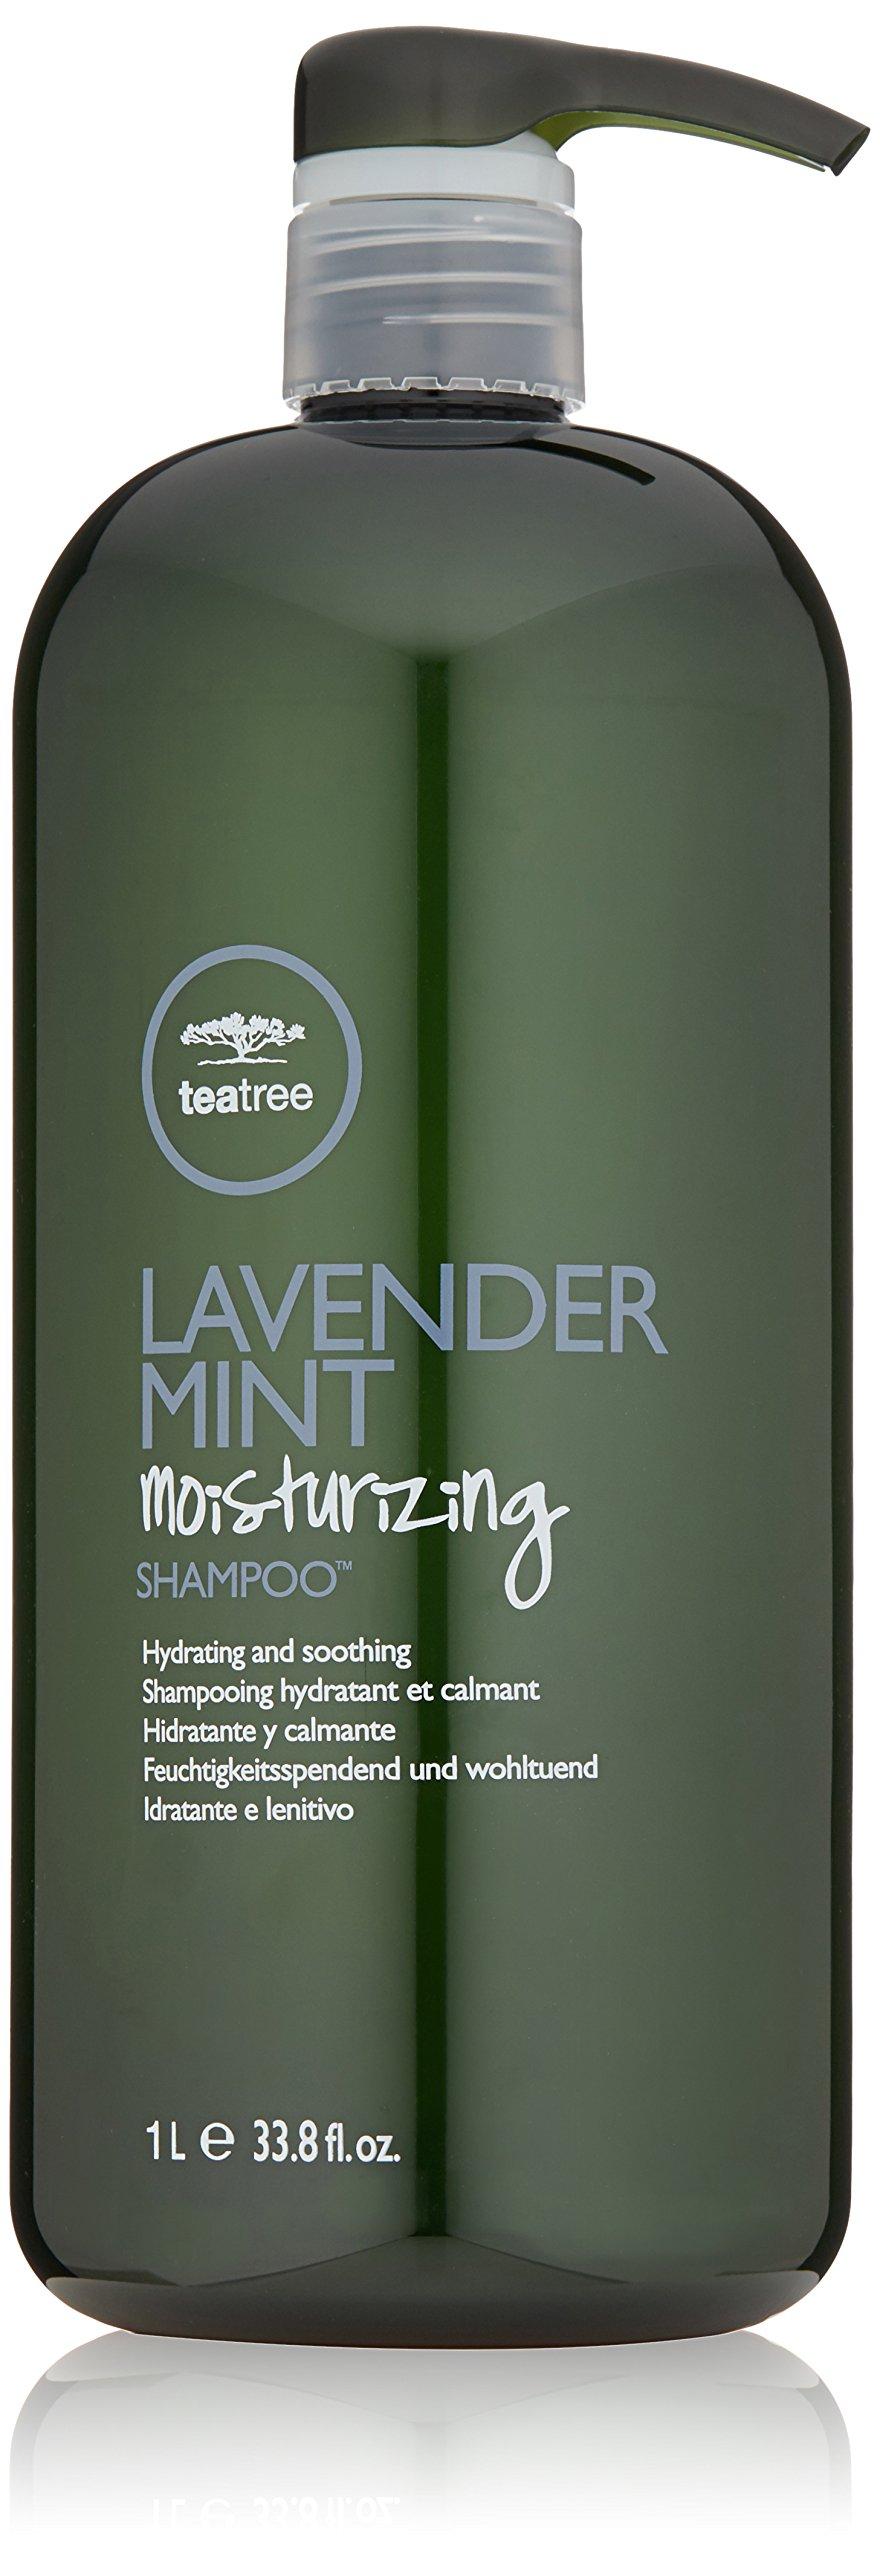 Tea Tree Lavender Mint Moisturizing Shampoo, 33.8 Fl Oz